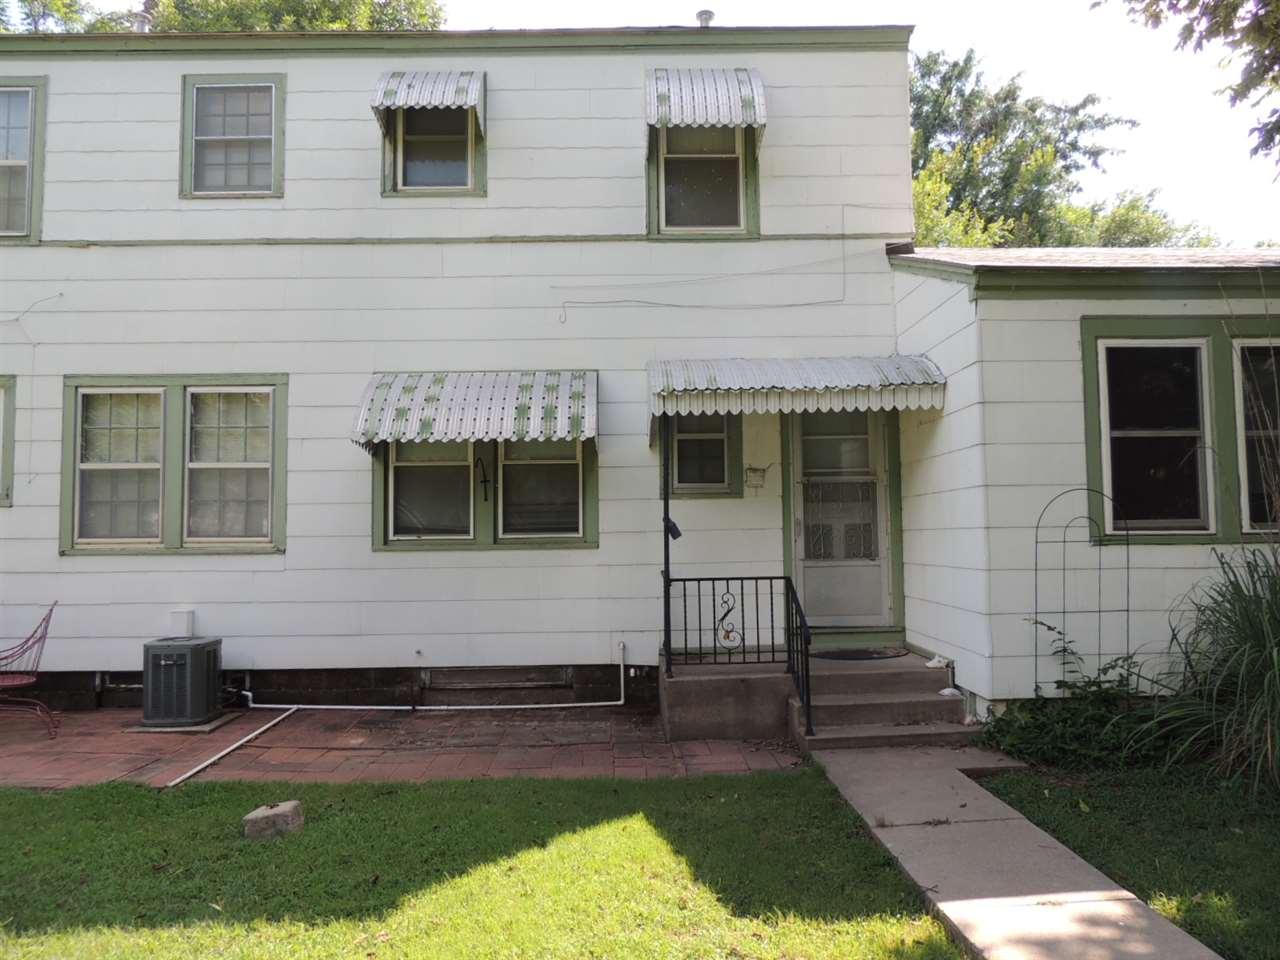 1255 S Pershing, Wichita, KS 67218